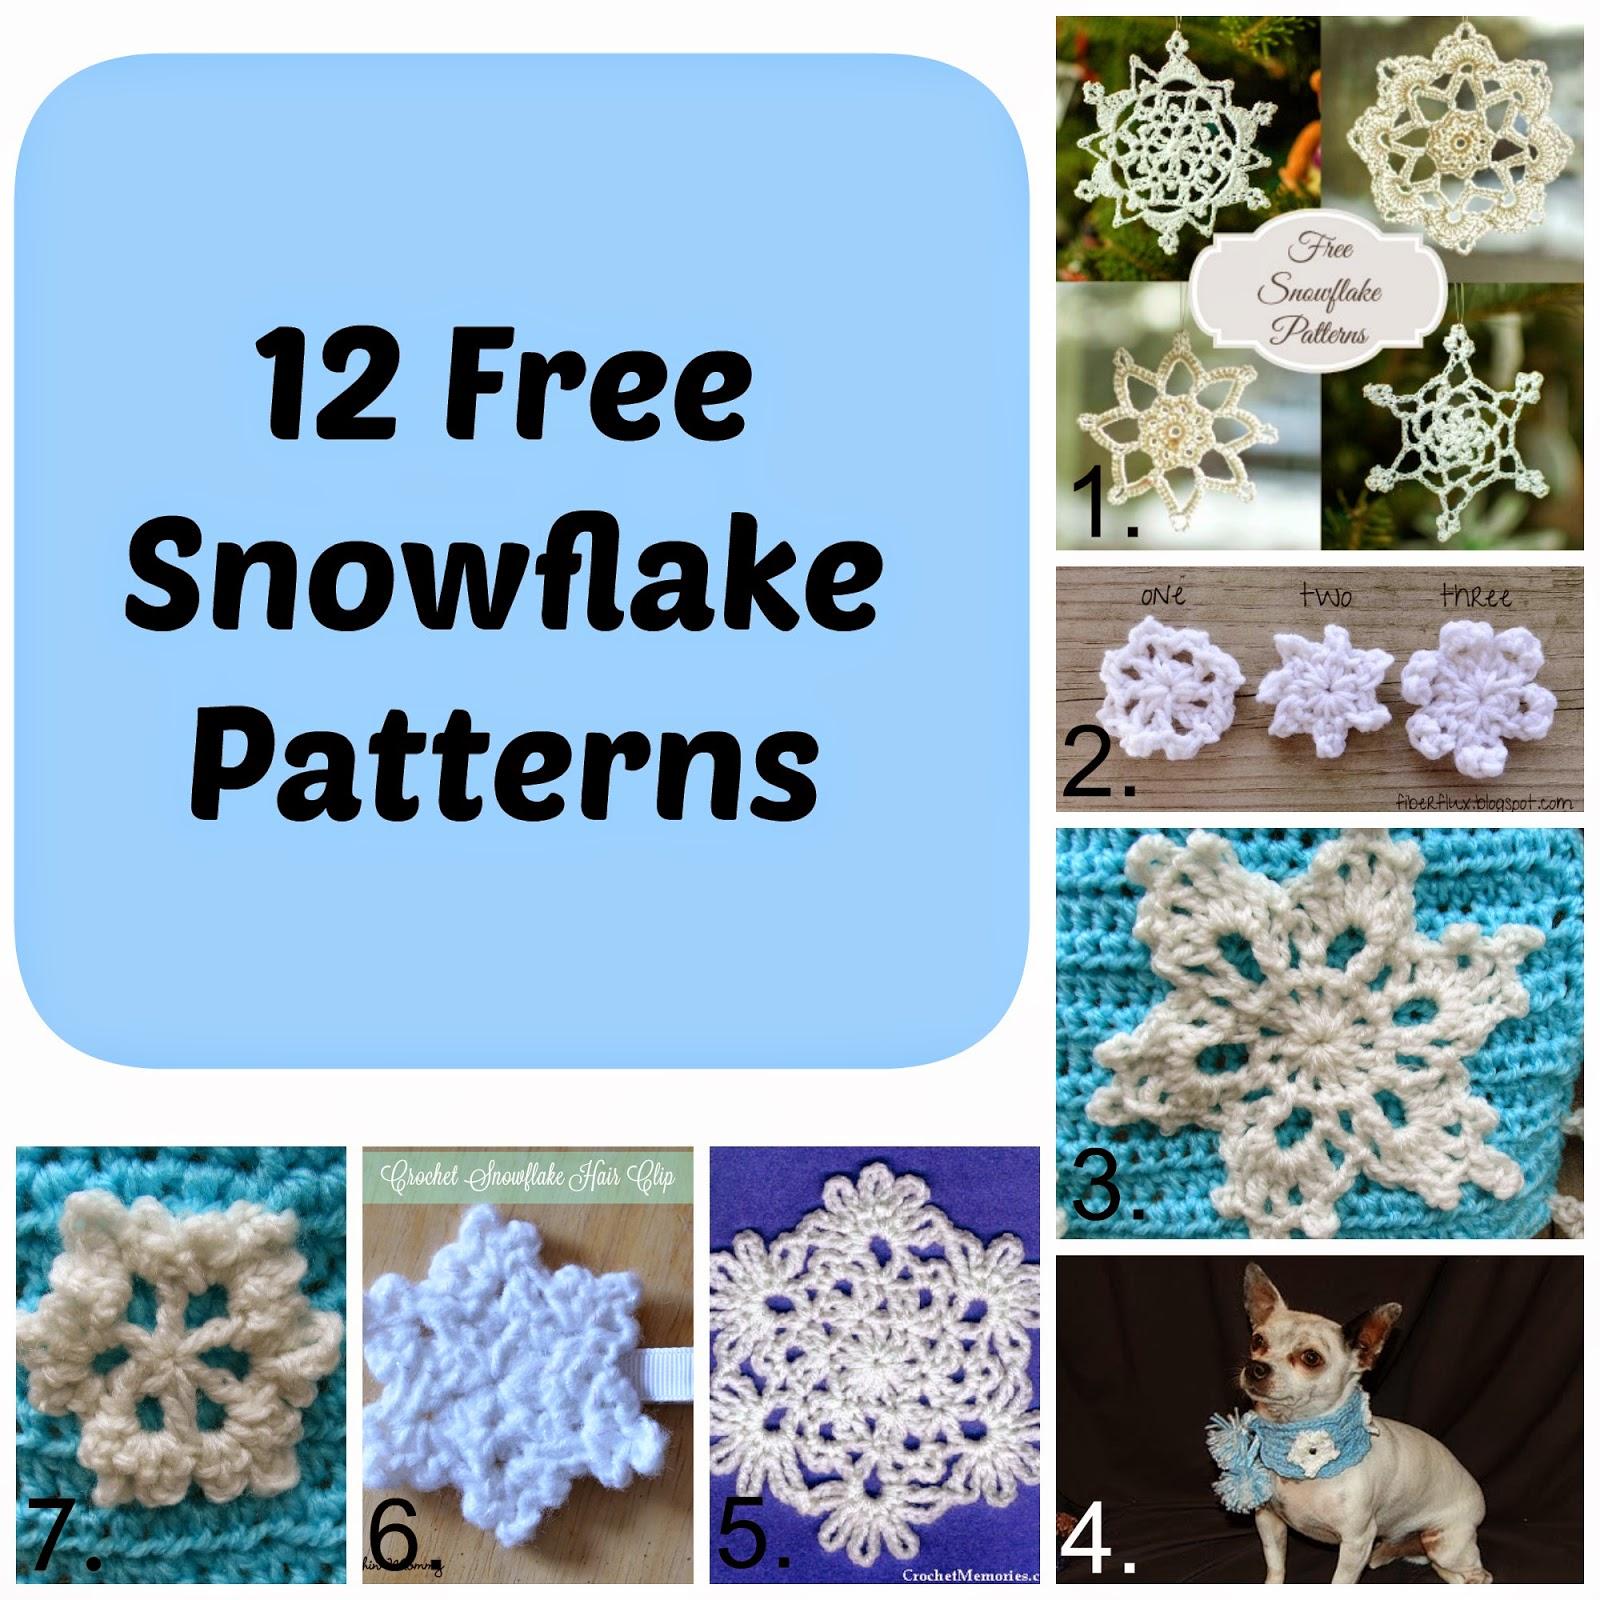 Knot Your Nana's Crochet: Snowflake Cape + 12 FREE Snowflake Patterns